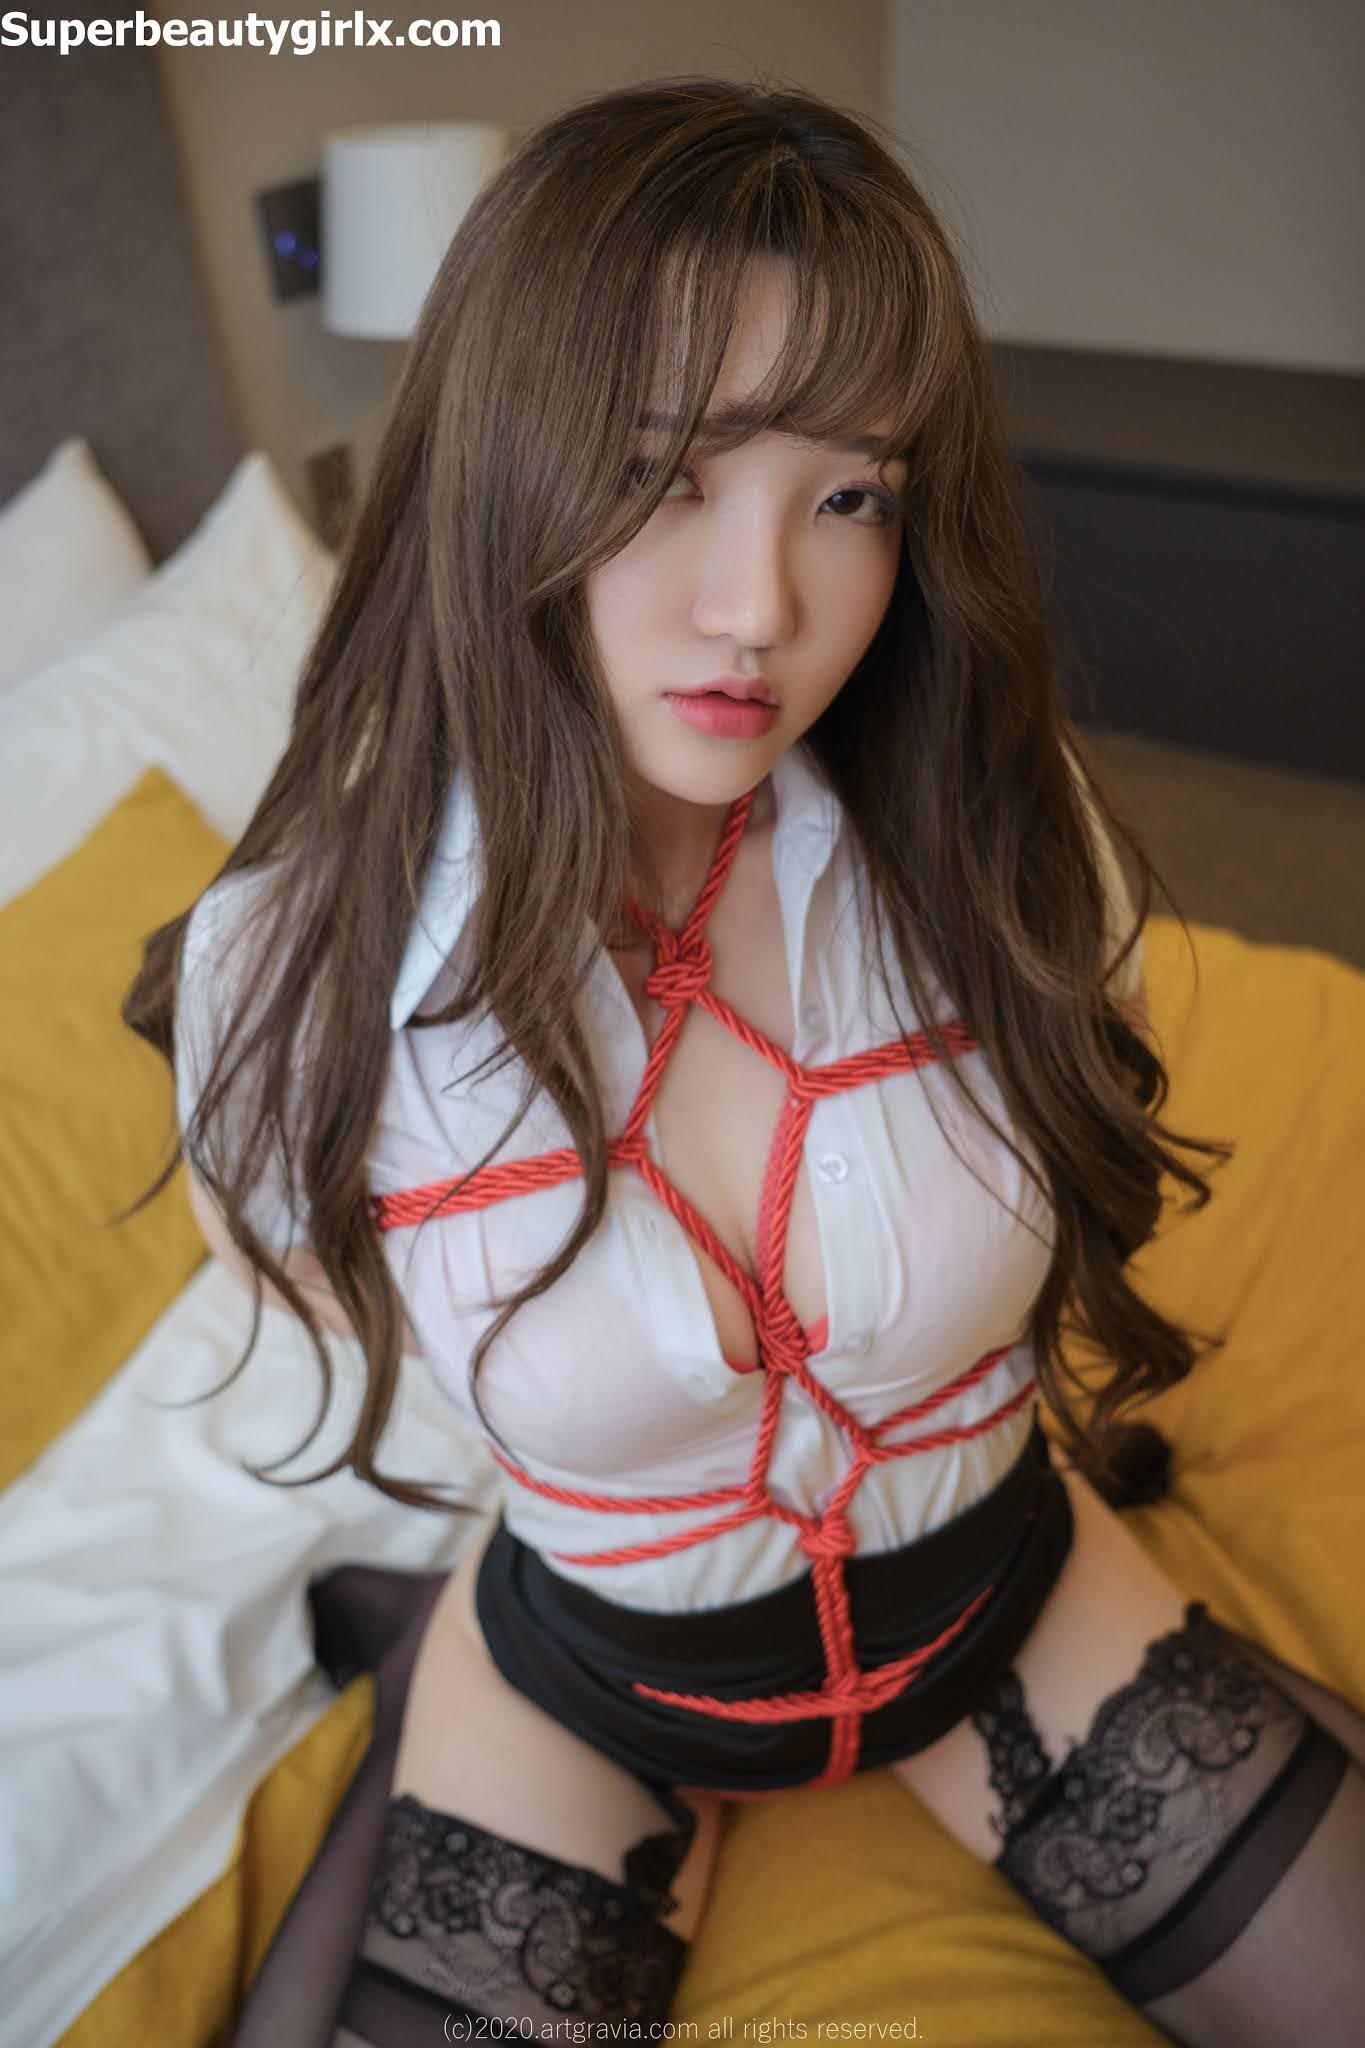 ArtGravia-Vol.217-Son-Ye-Eun-Superbeautygirlx.com